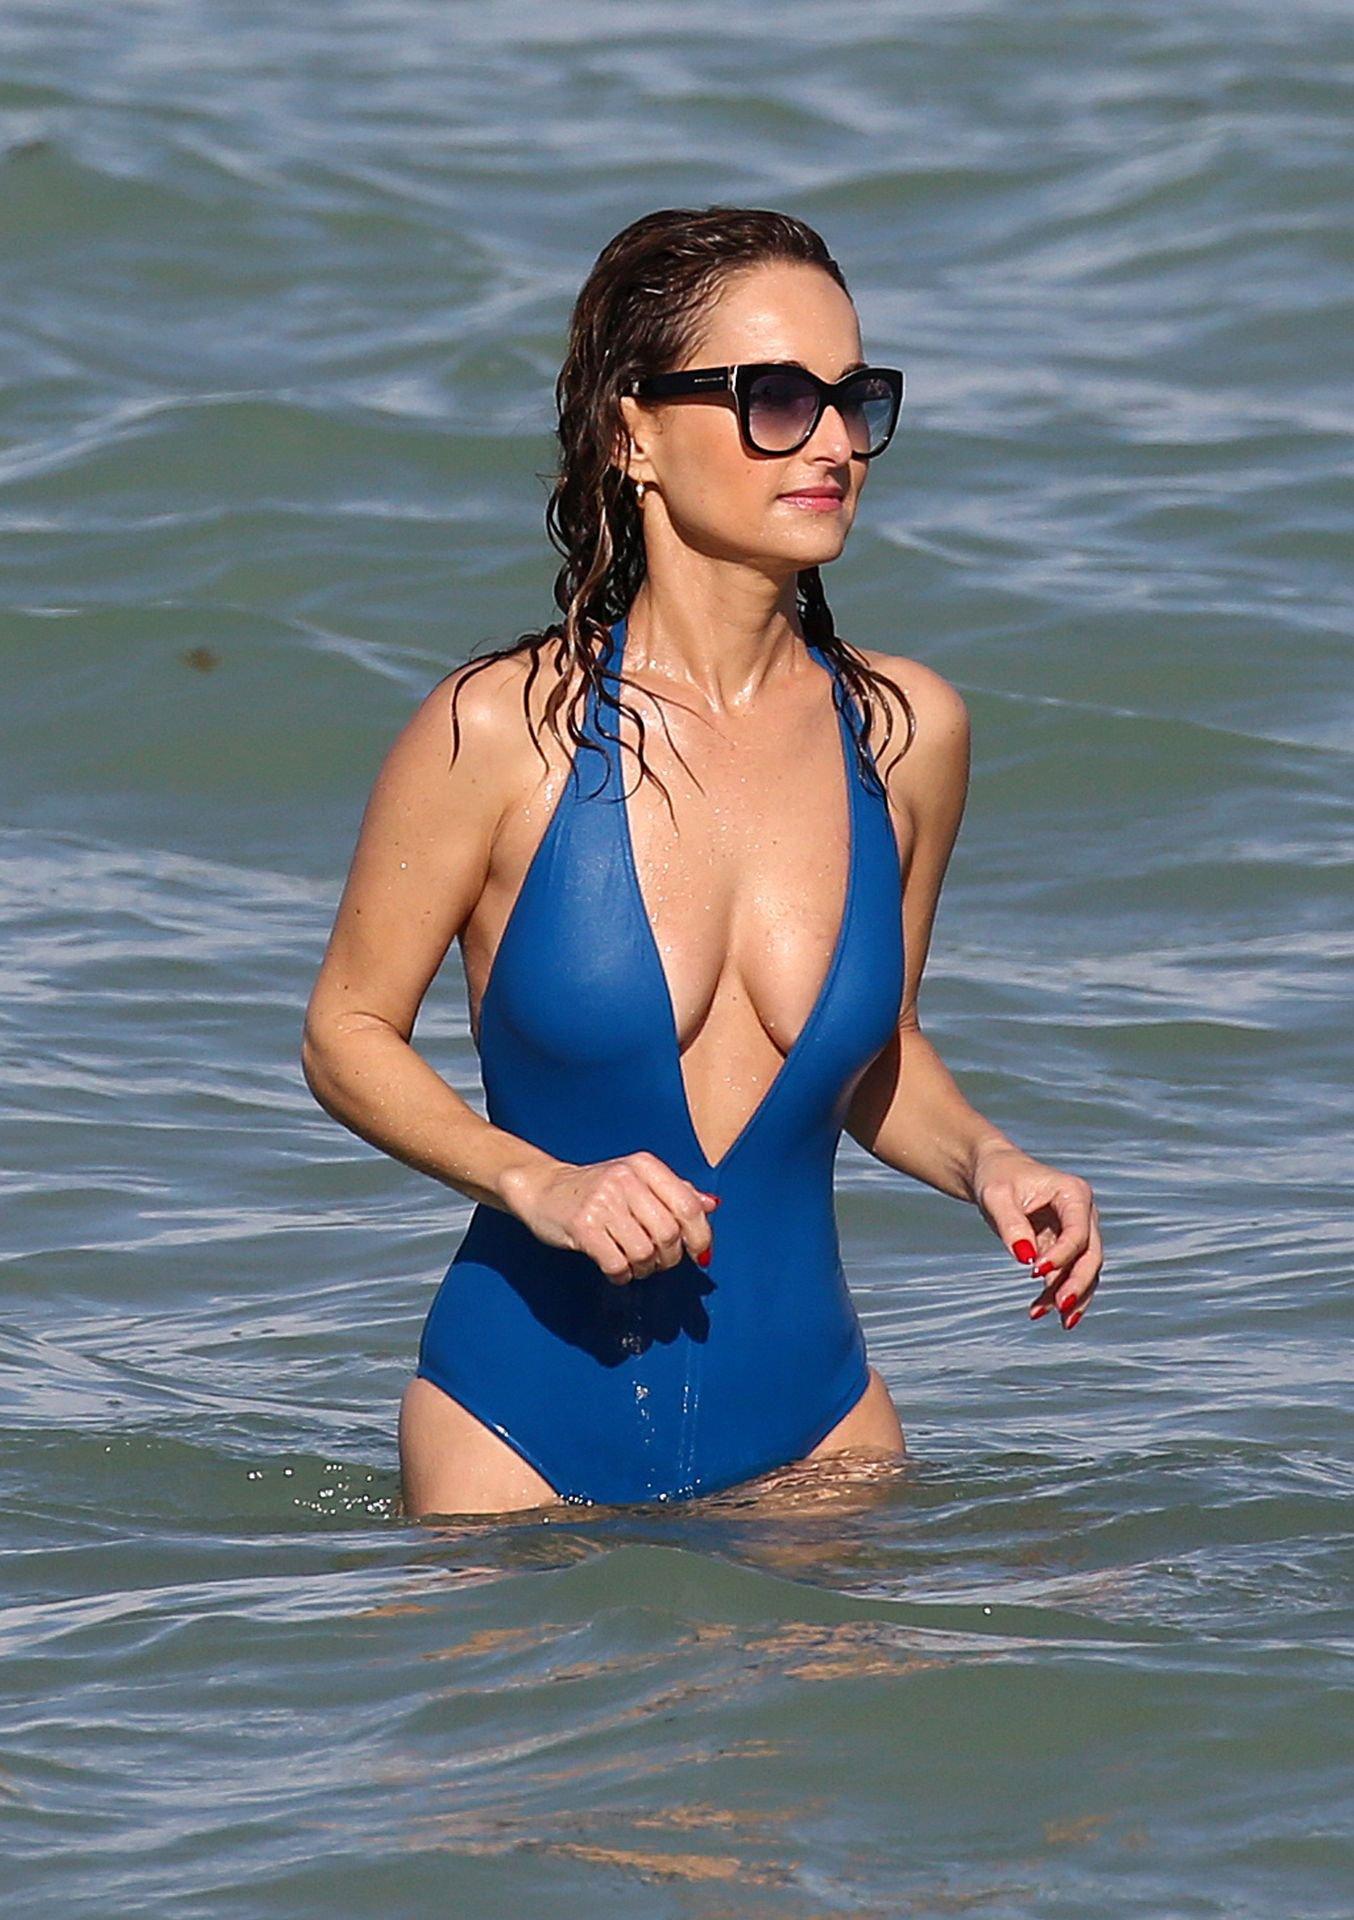 Giada De Laurentiss Sexy Swimsuit